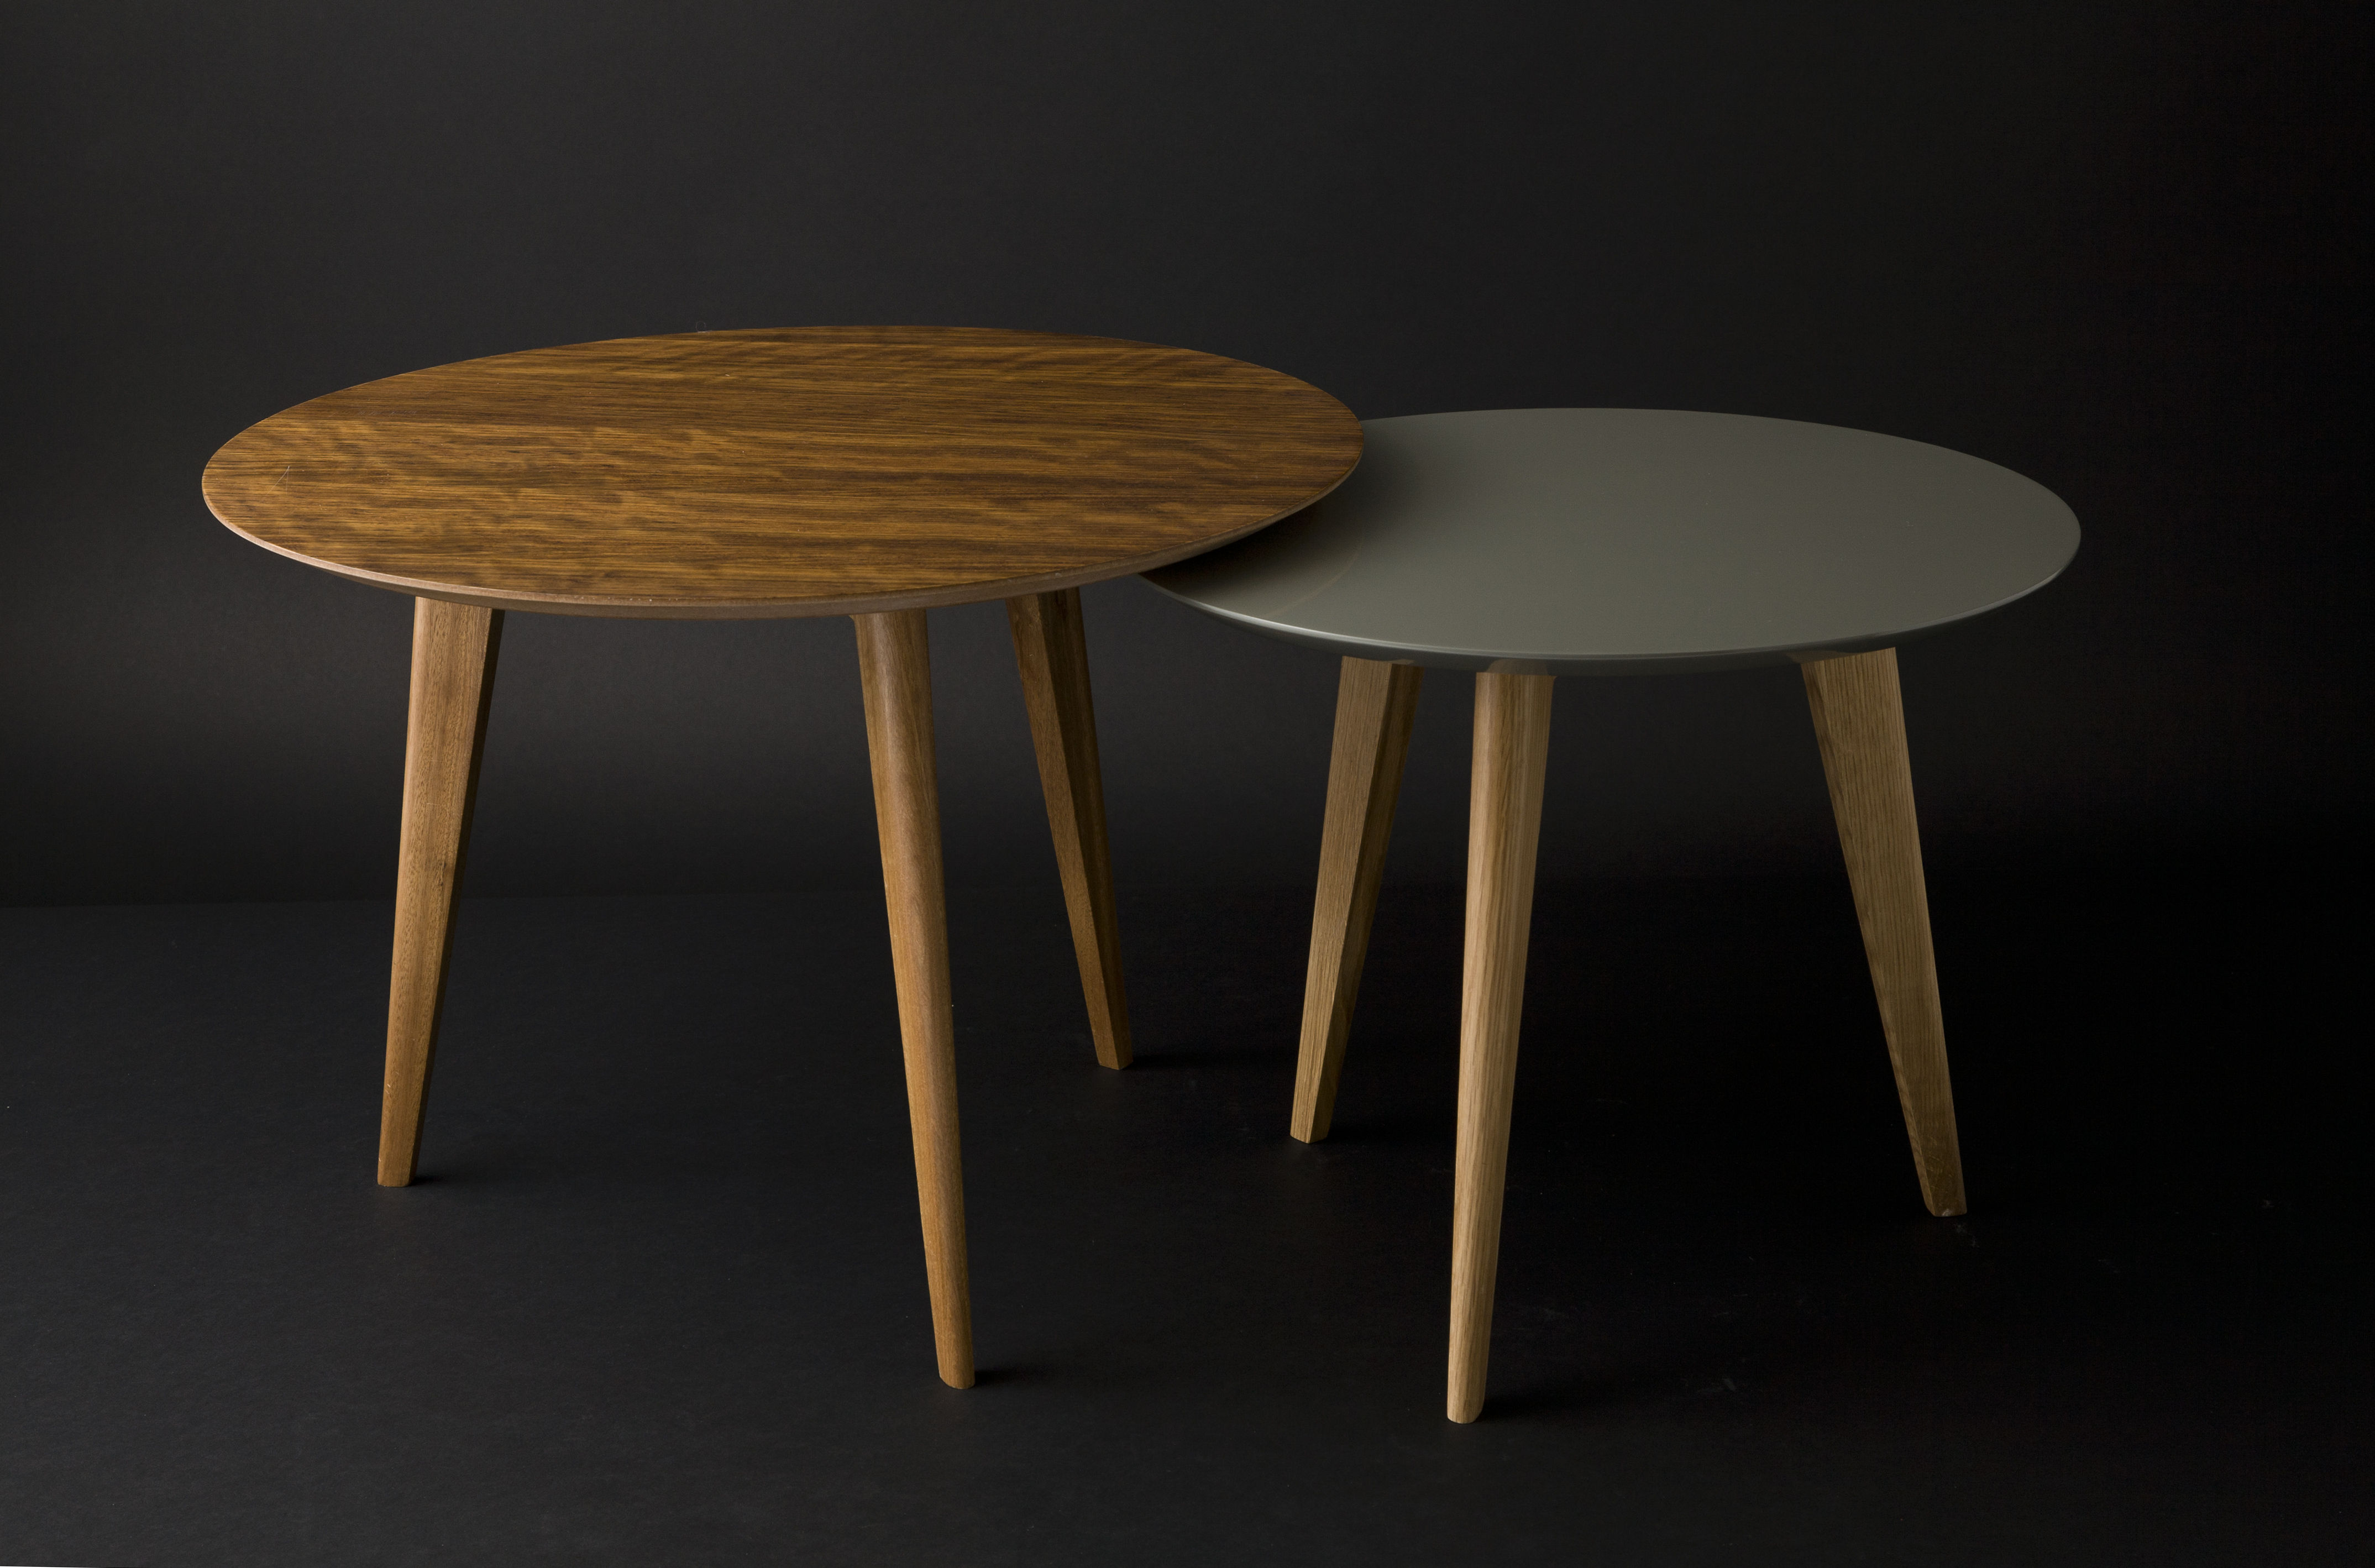 Table basse lalinde small sentou edition rouge bois naturel made in design - Sentou table basse ...